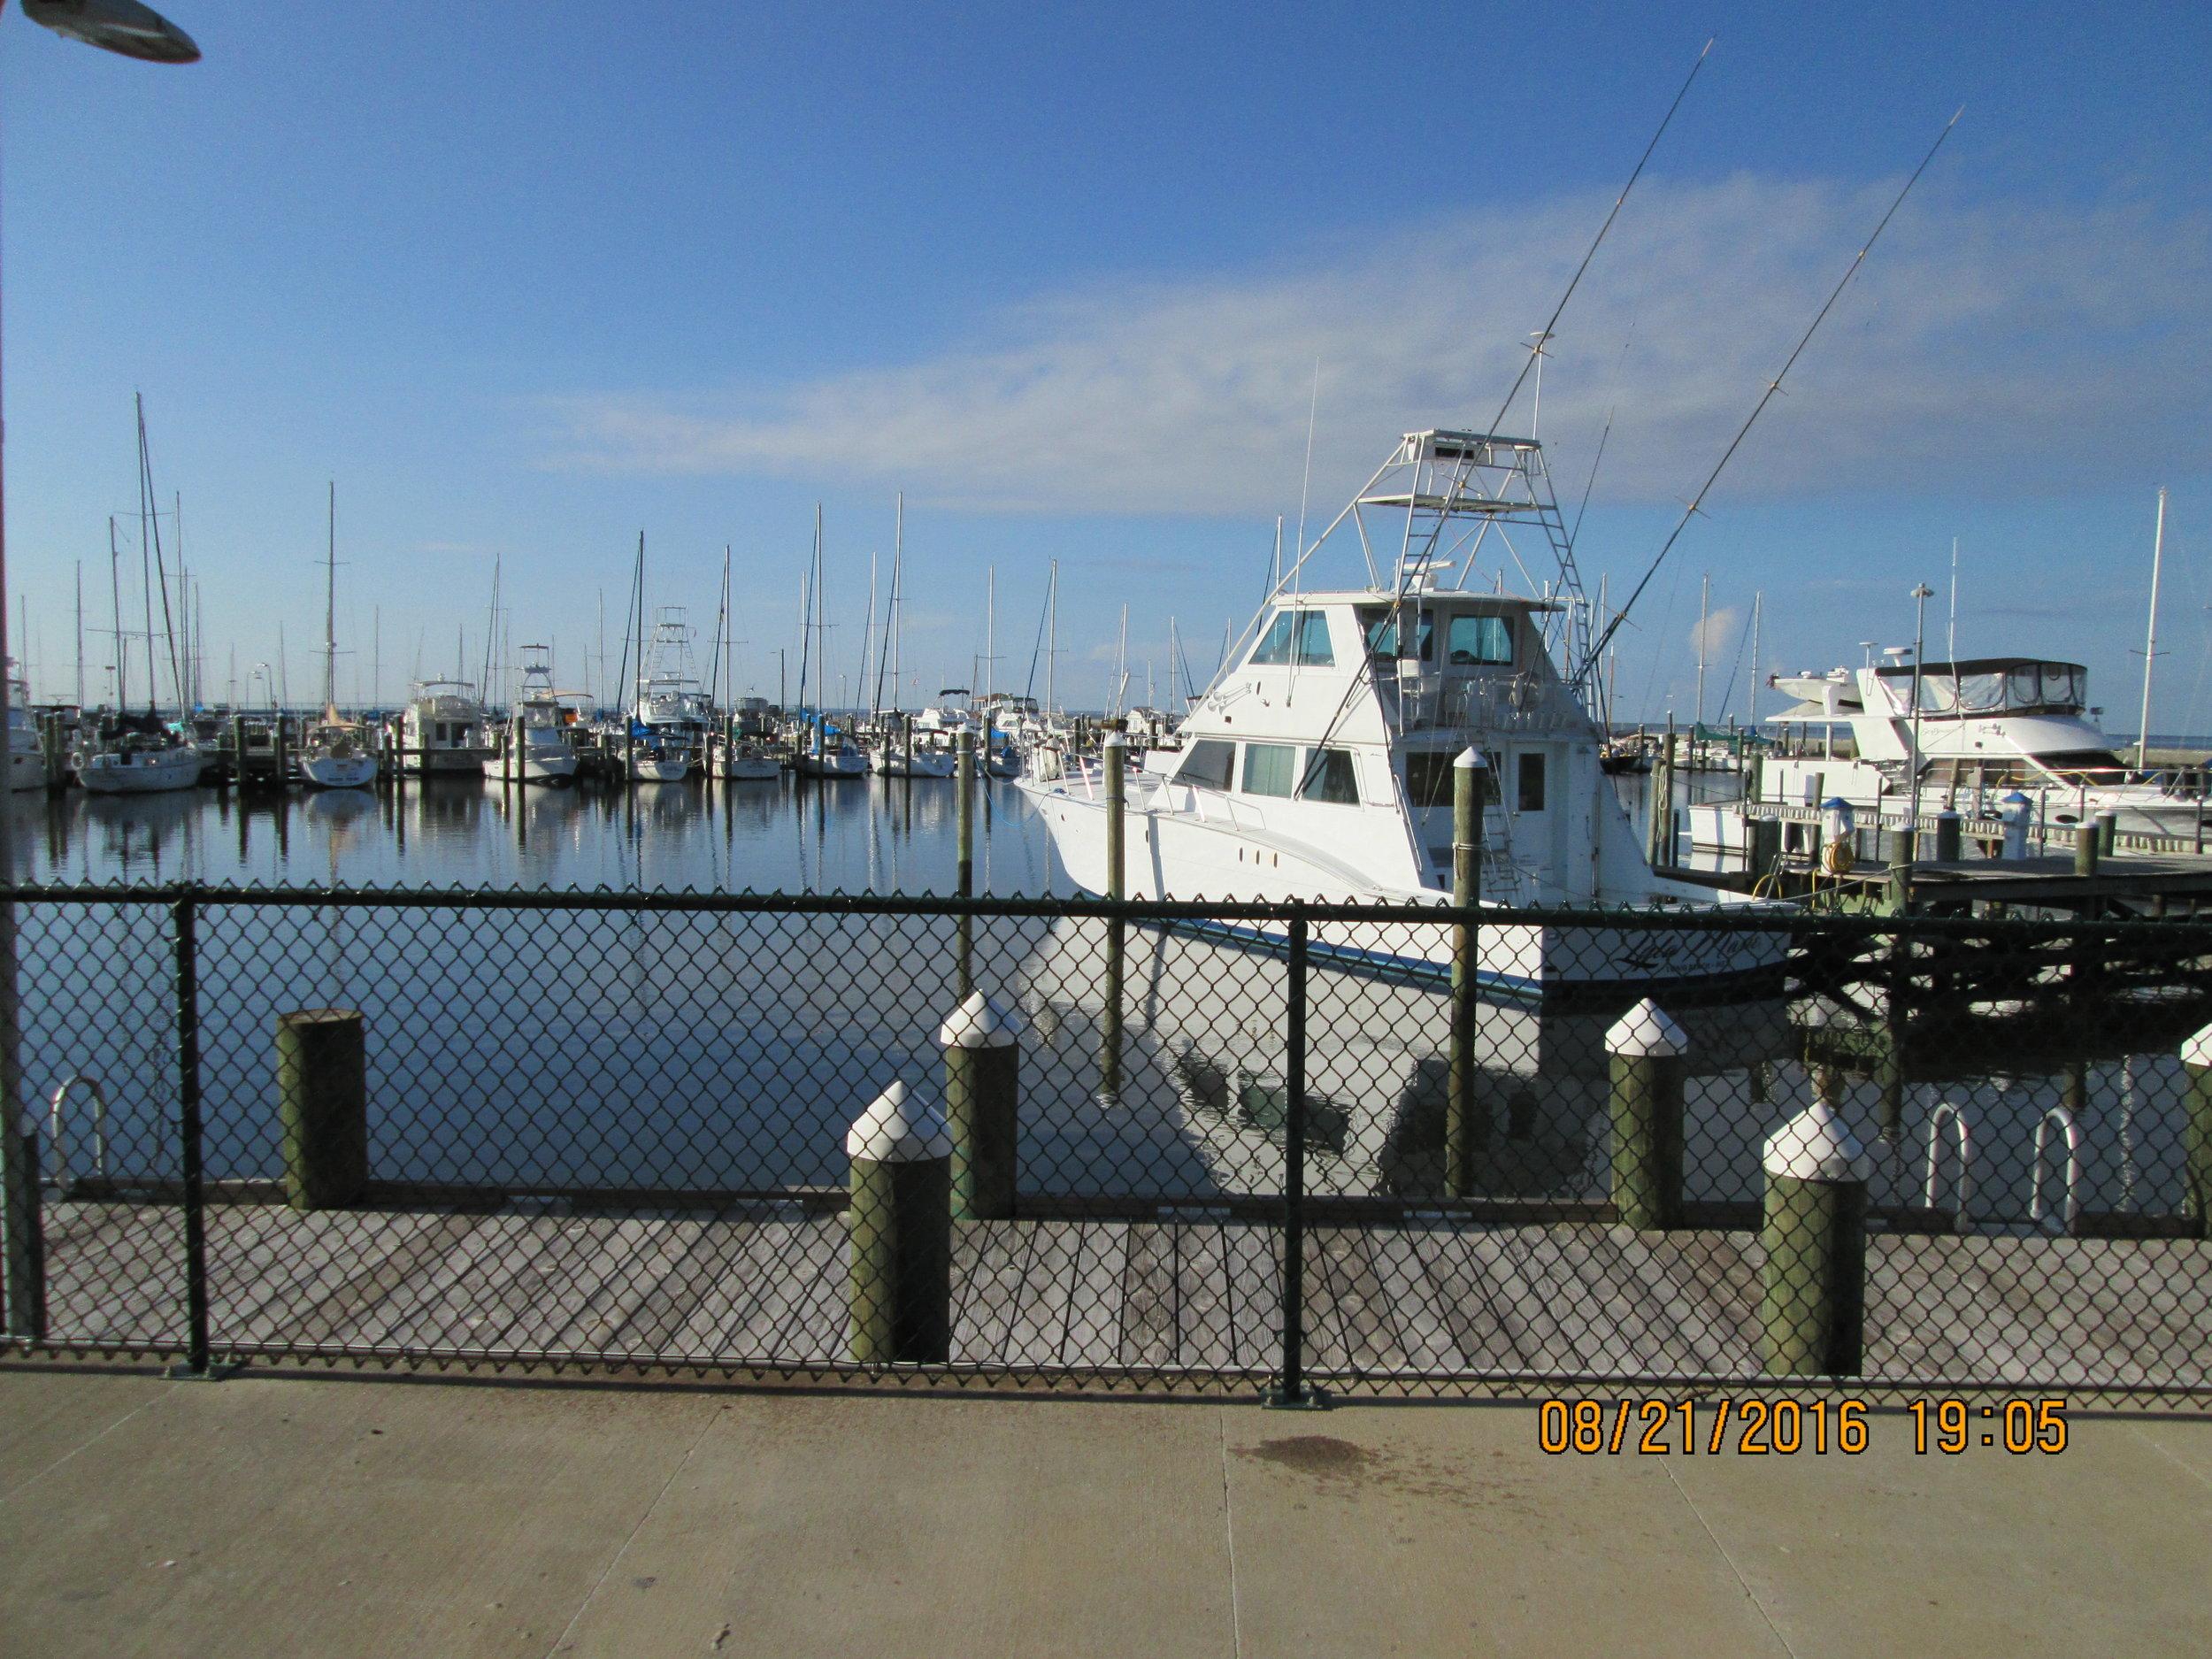 Commercial and charter fleet, Long Beach marina, MS.